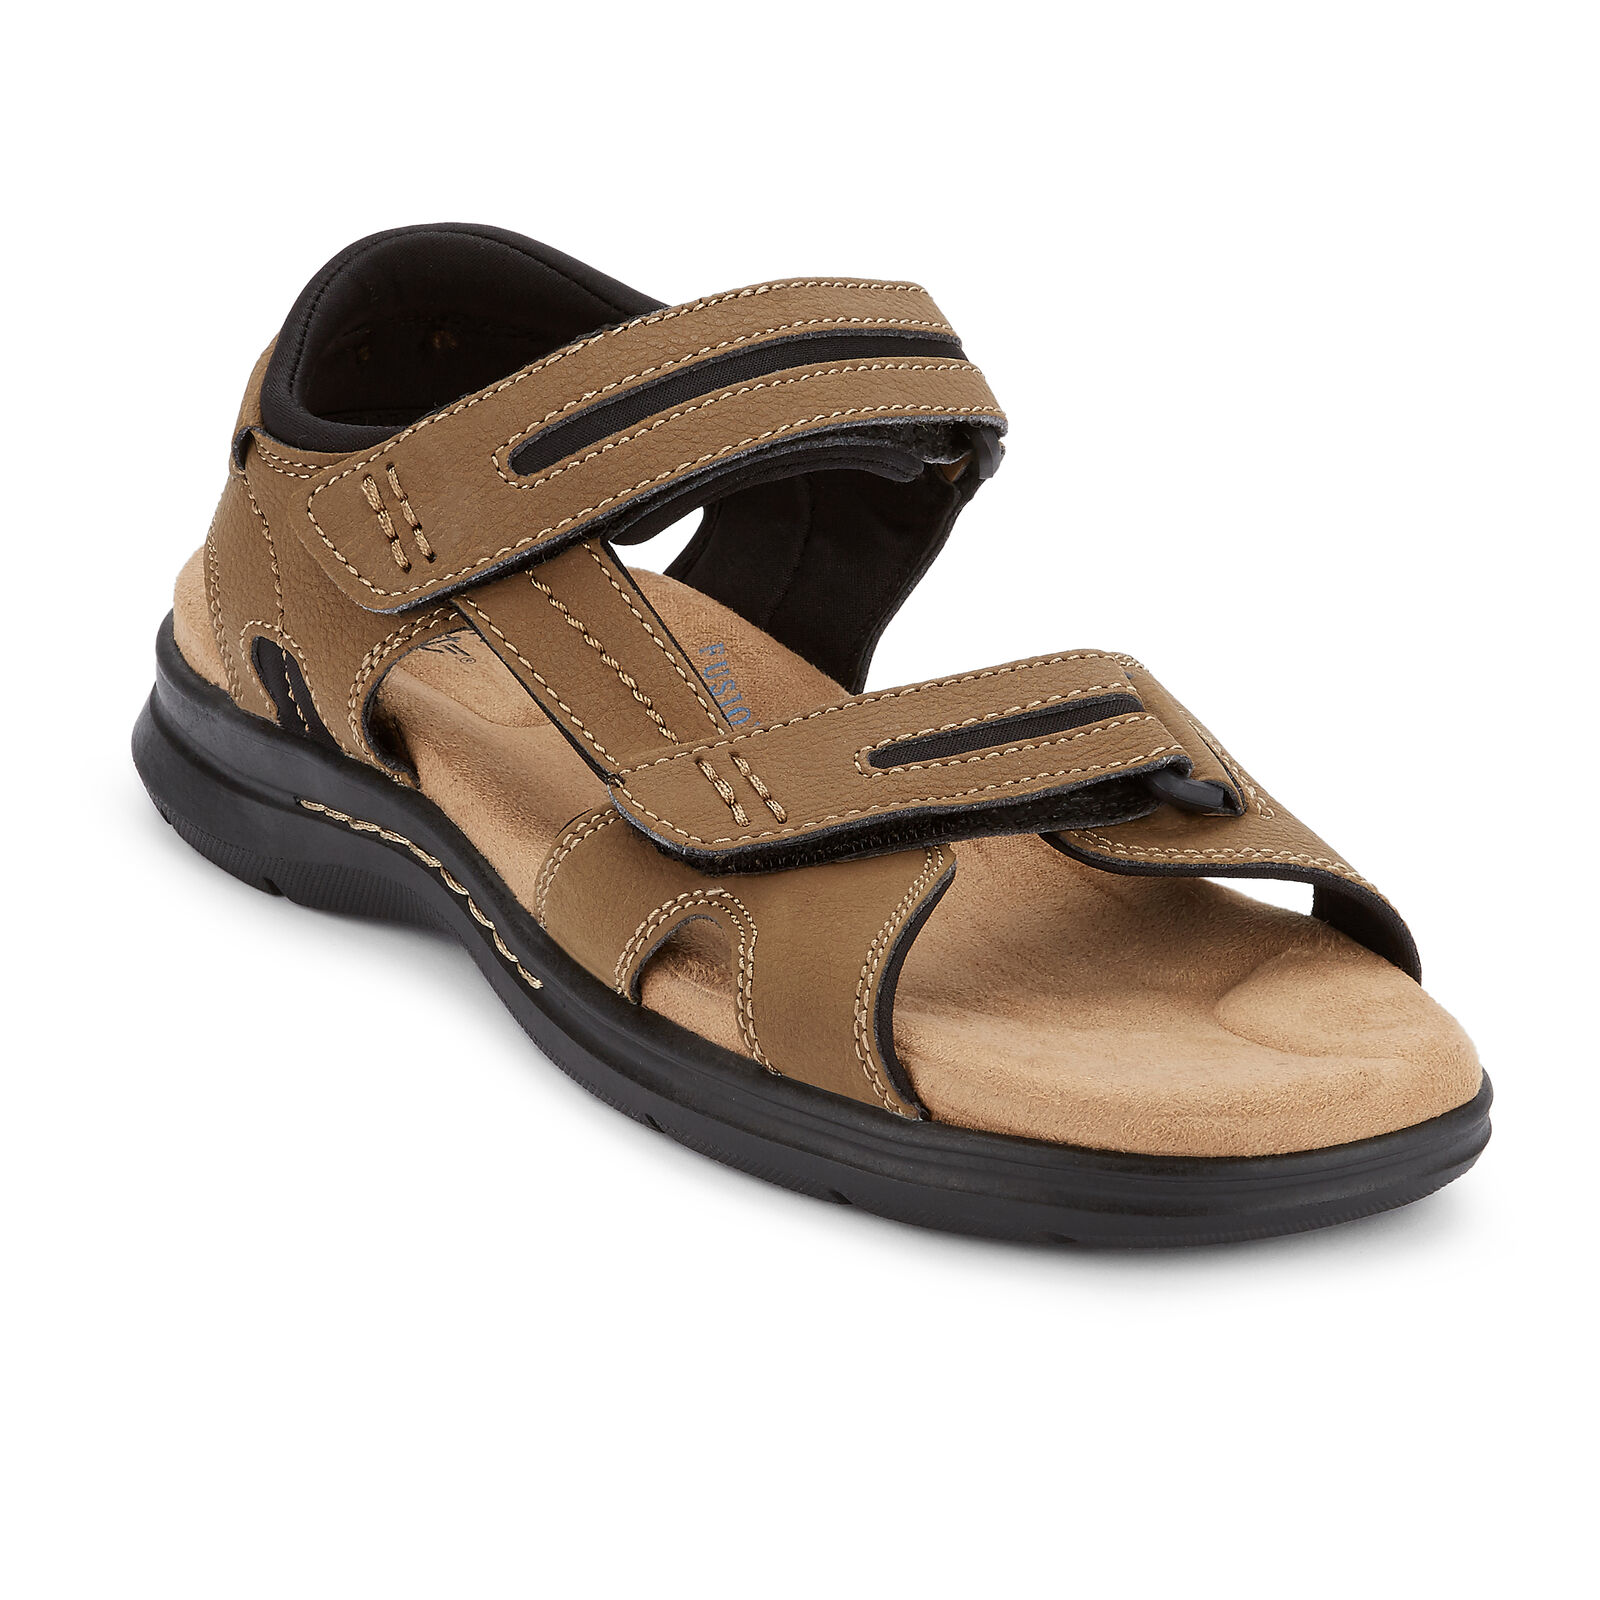 ad9a3f55de1e20 Dockers Mens Solano Casual Comfort Outdoor Sport Adjustable Sandal Shoe 아이템  넘버  253734661785.